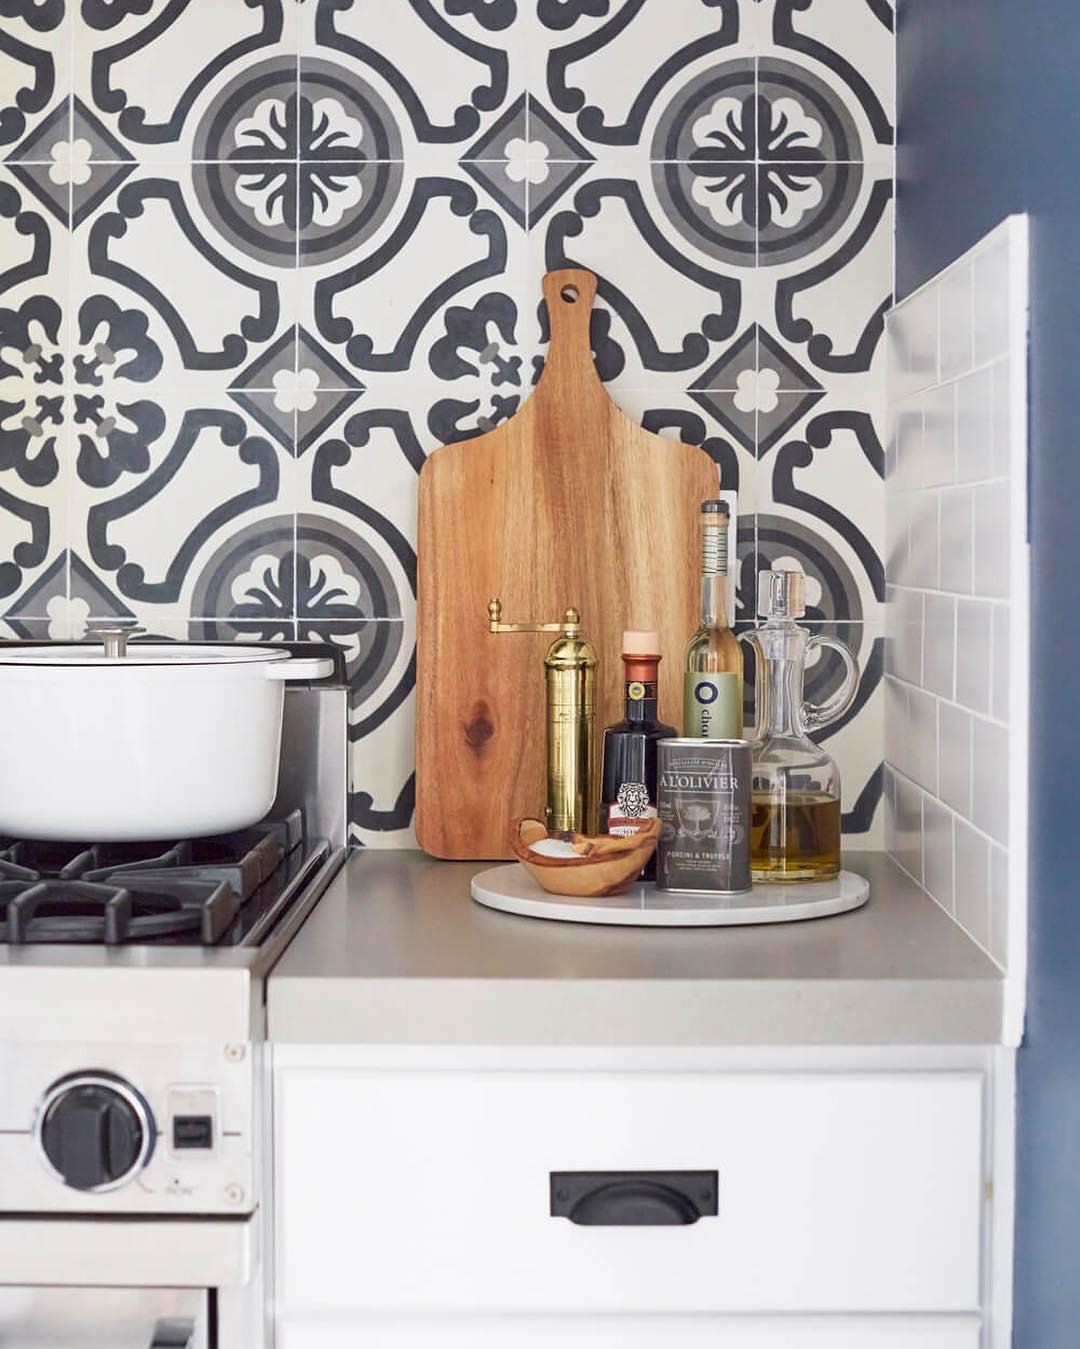 Kitchen Wall Tiles Design 2017